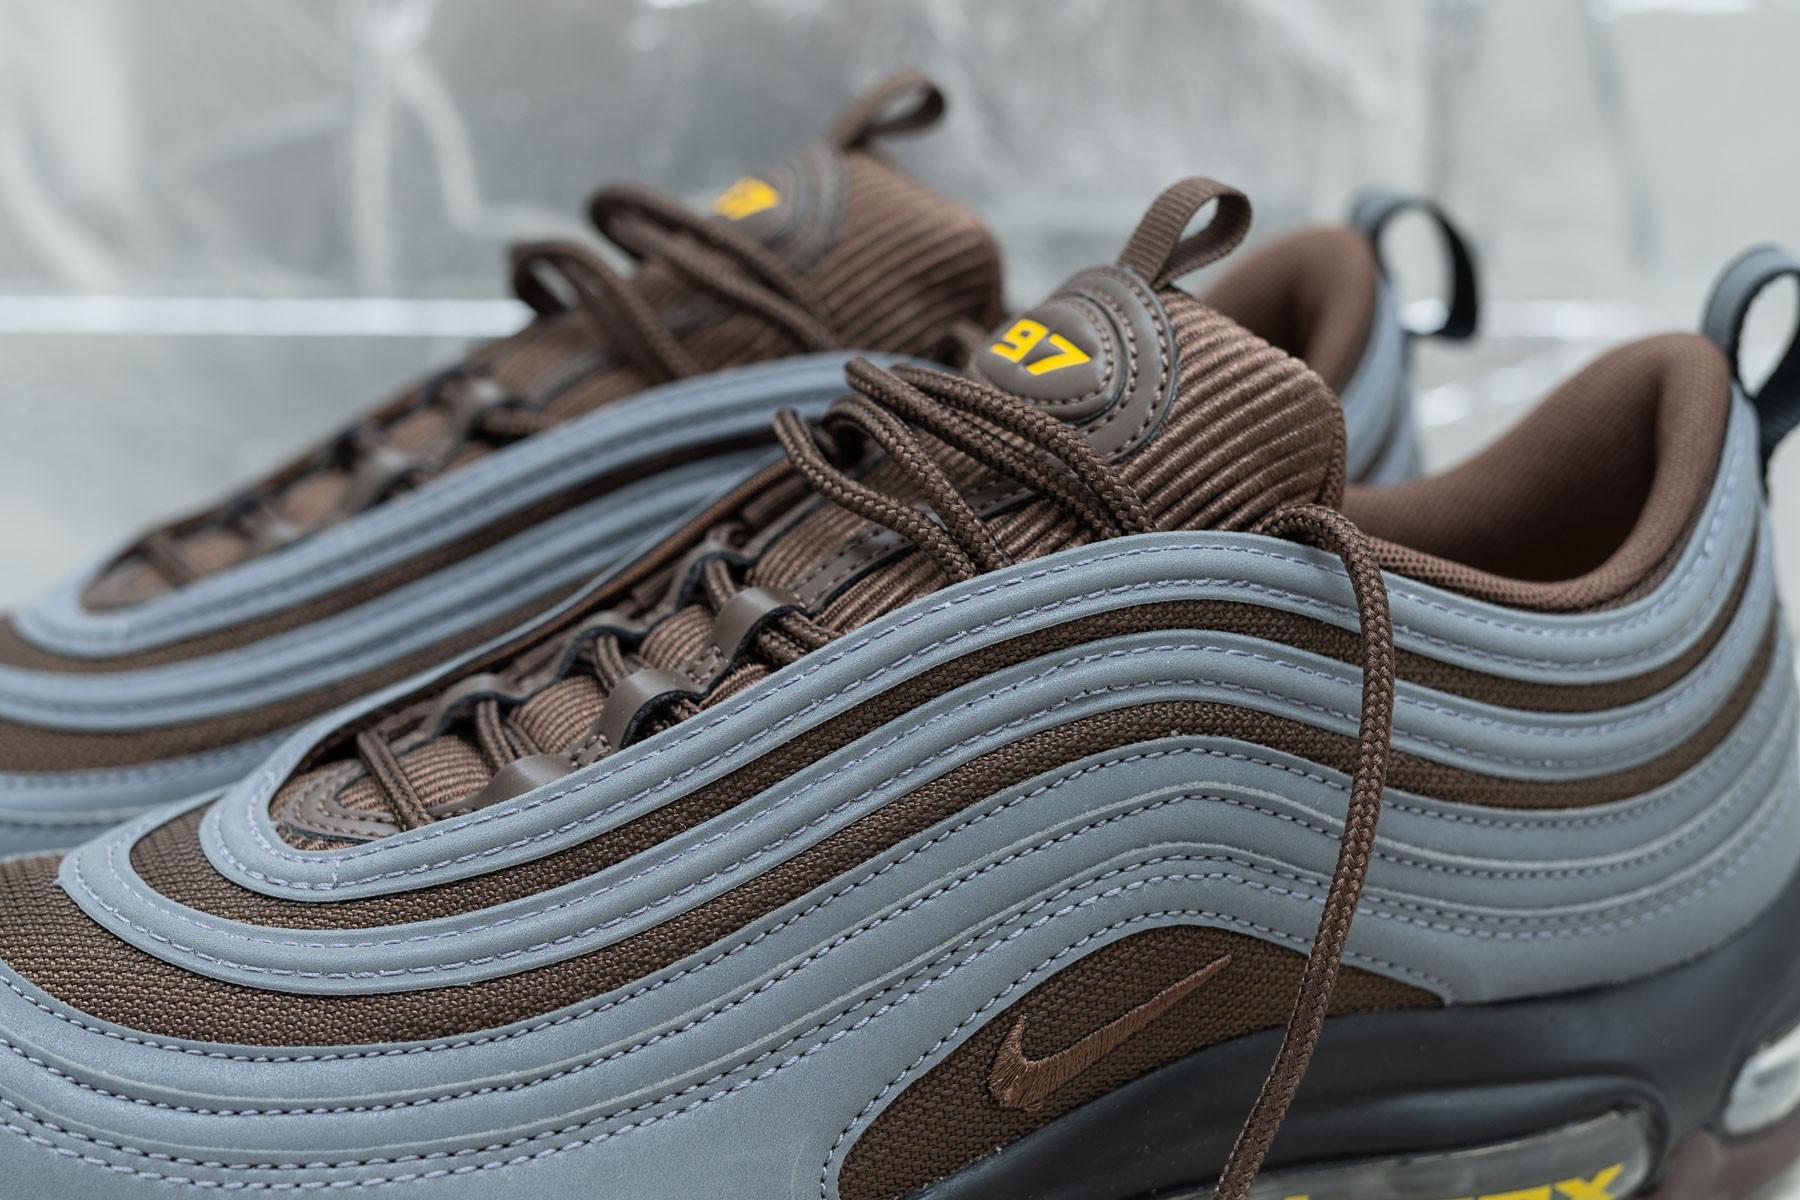 Nike Air Max 97 PRM Herre Sneakers Sneaker.no